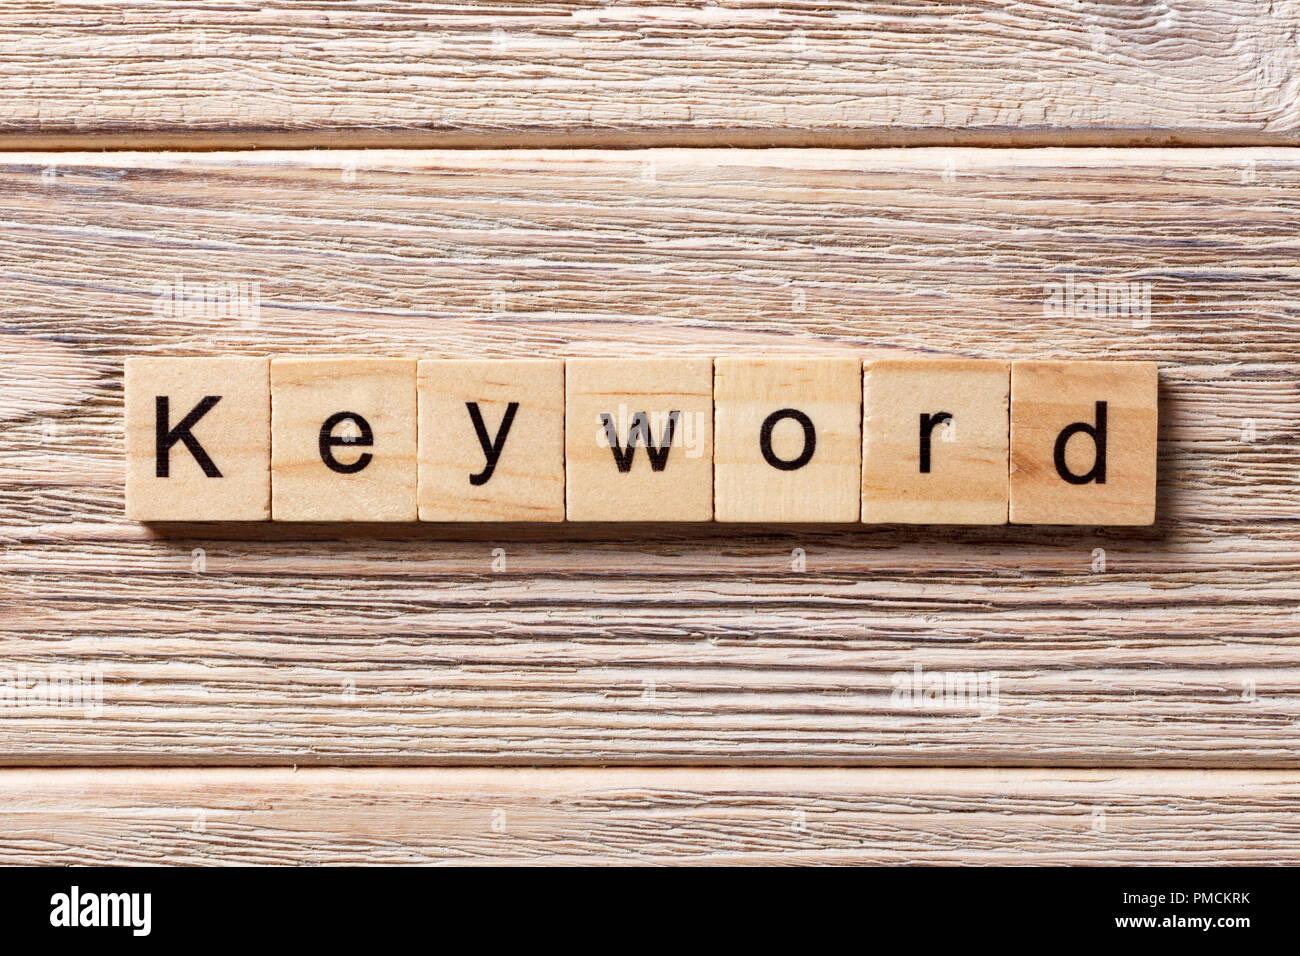 KEYWORD word written on wood block. KEYWORD text on table, concept. - Stock Image